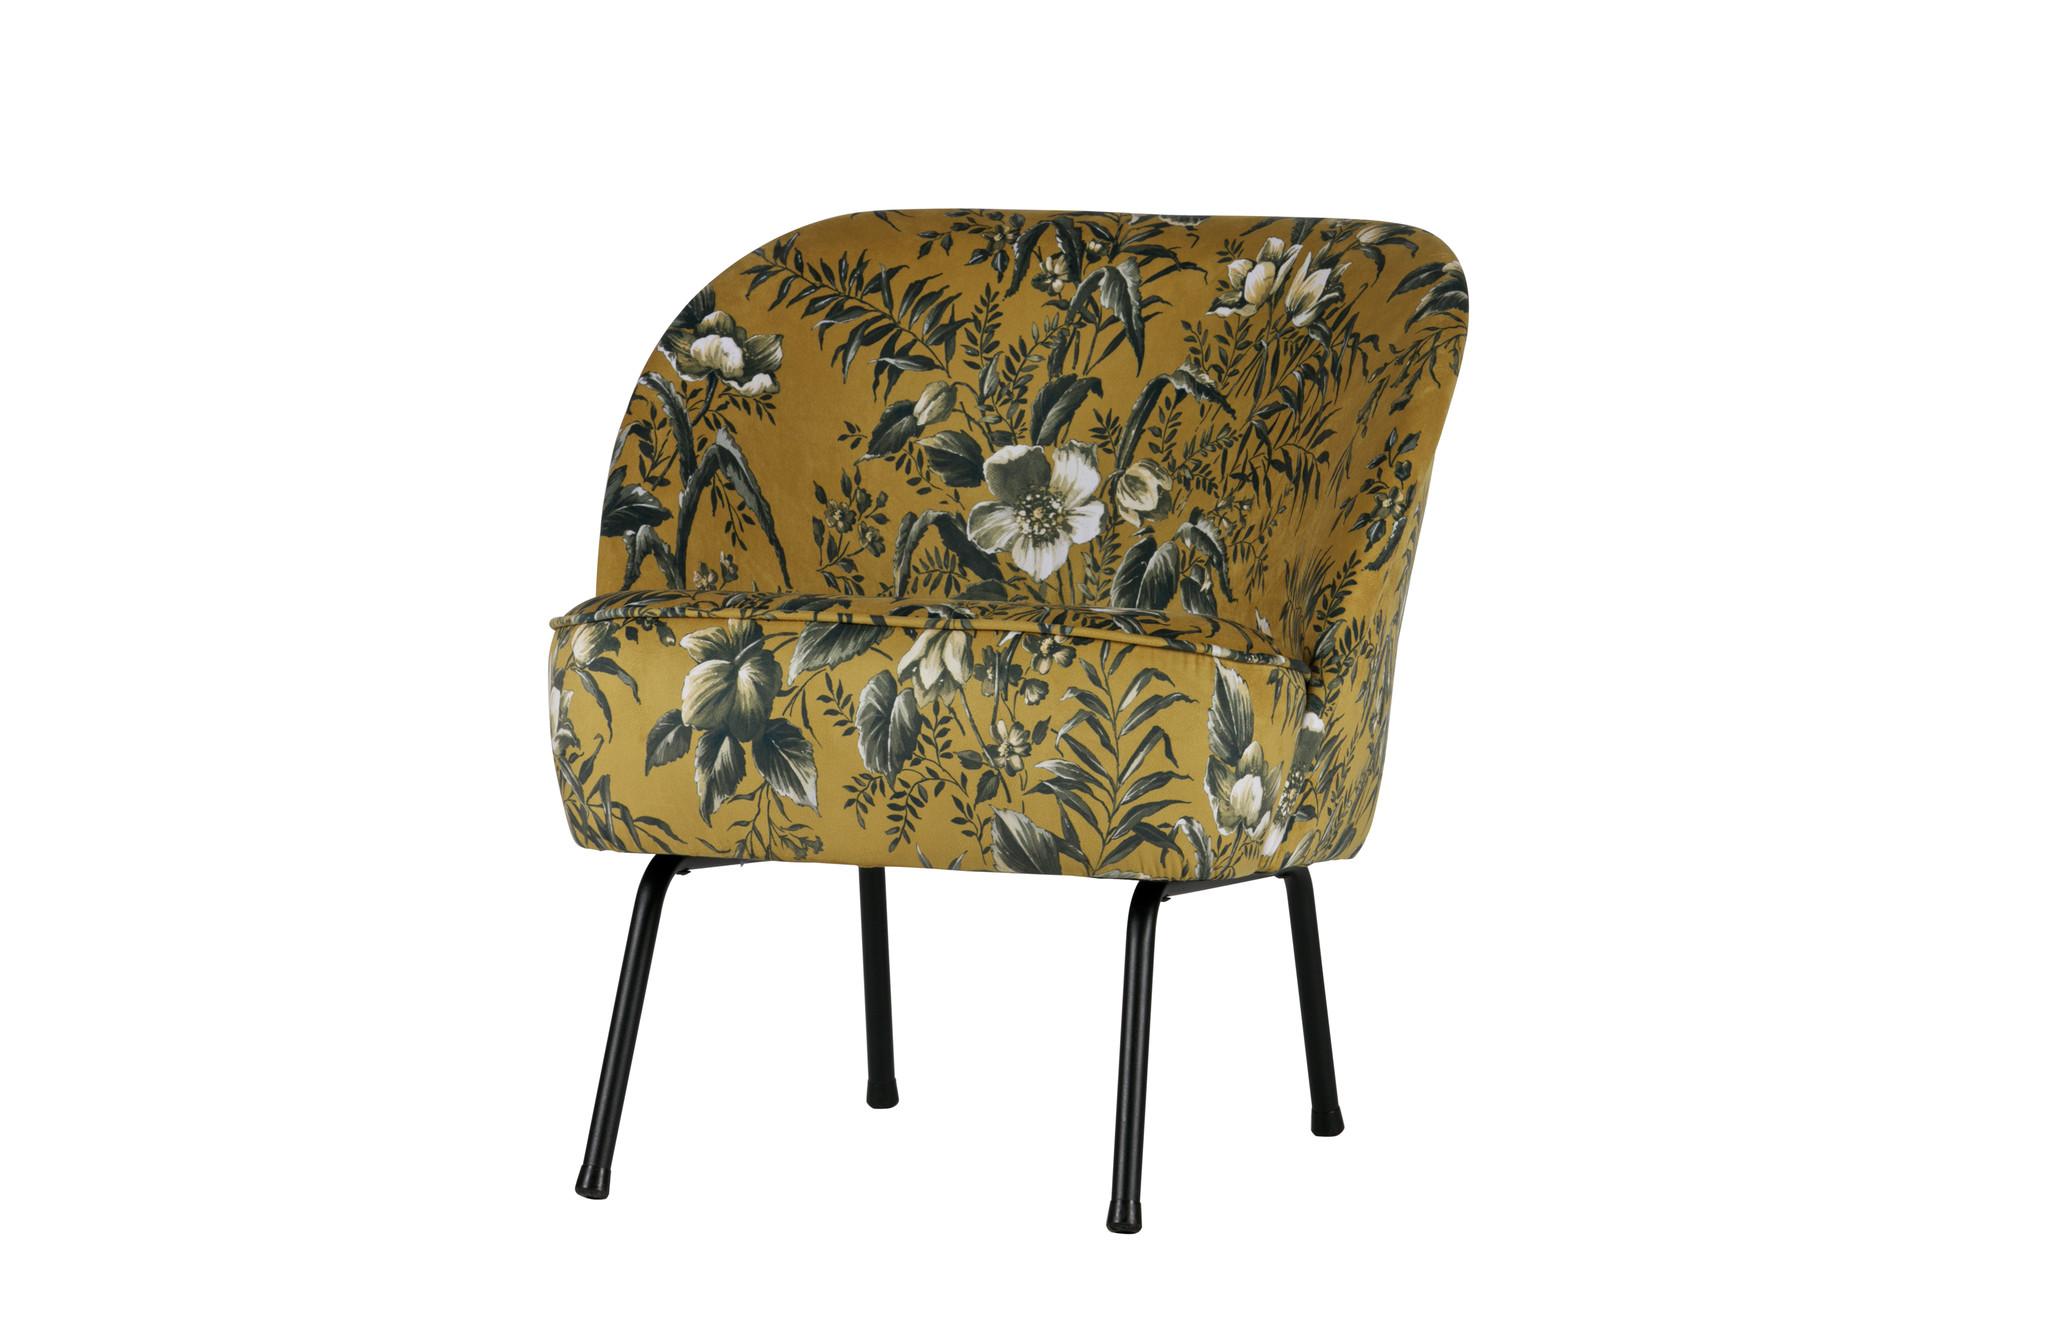 Vogue fauteuil poppy mosterd